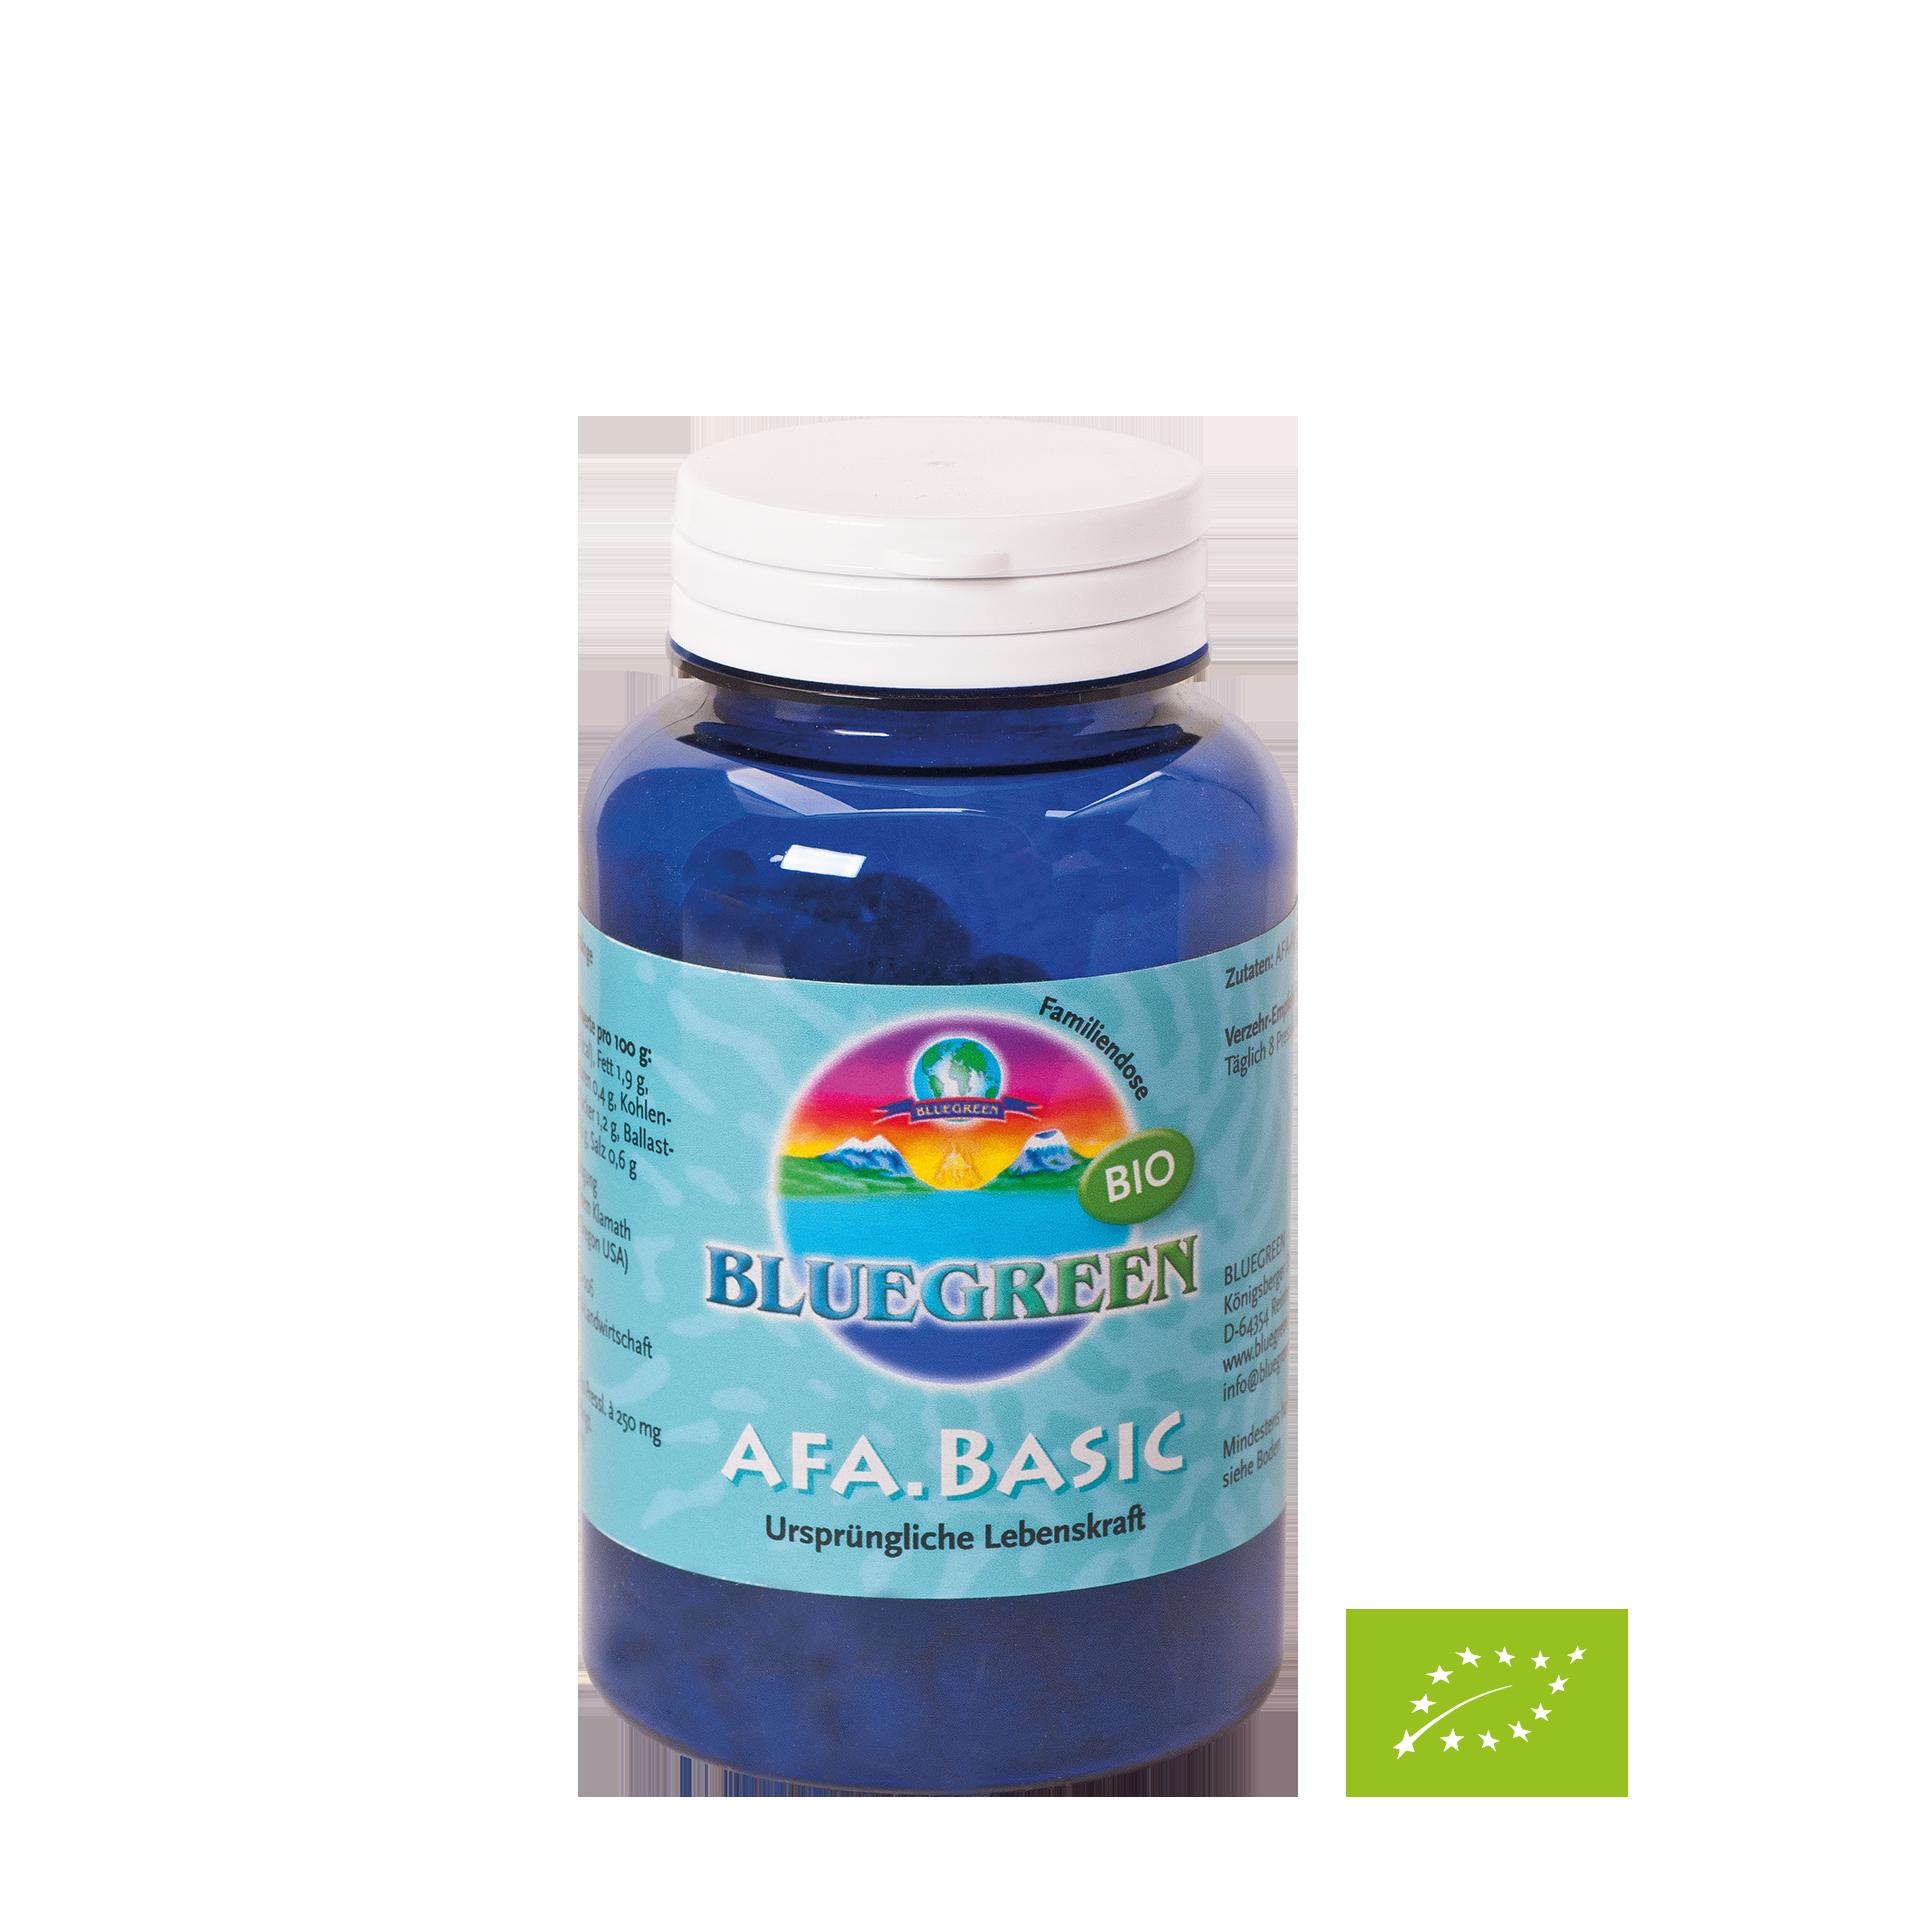 Bluegreen AFA Basic Bio, ca. 360 Presslinge, 90g